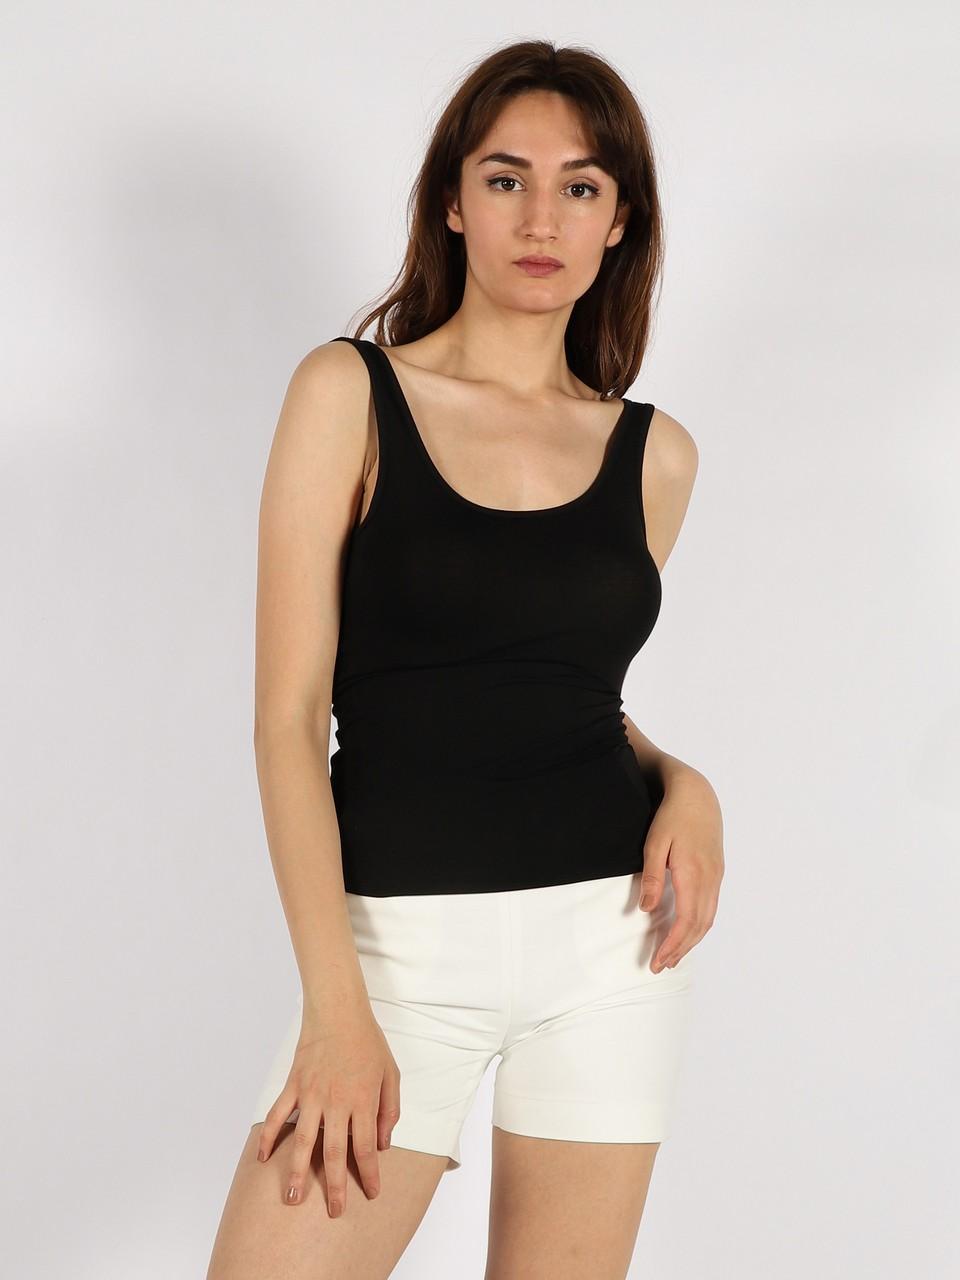 Low Back Flexible Top